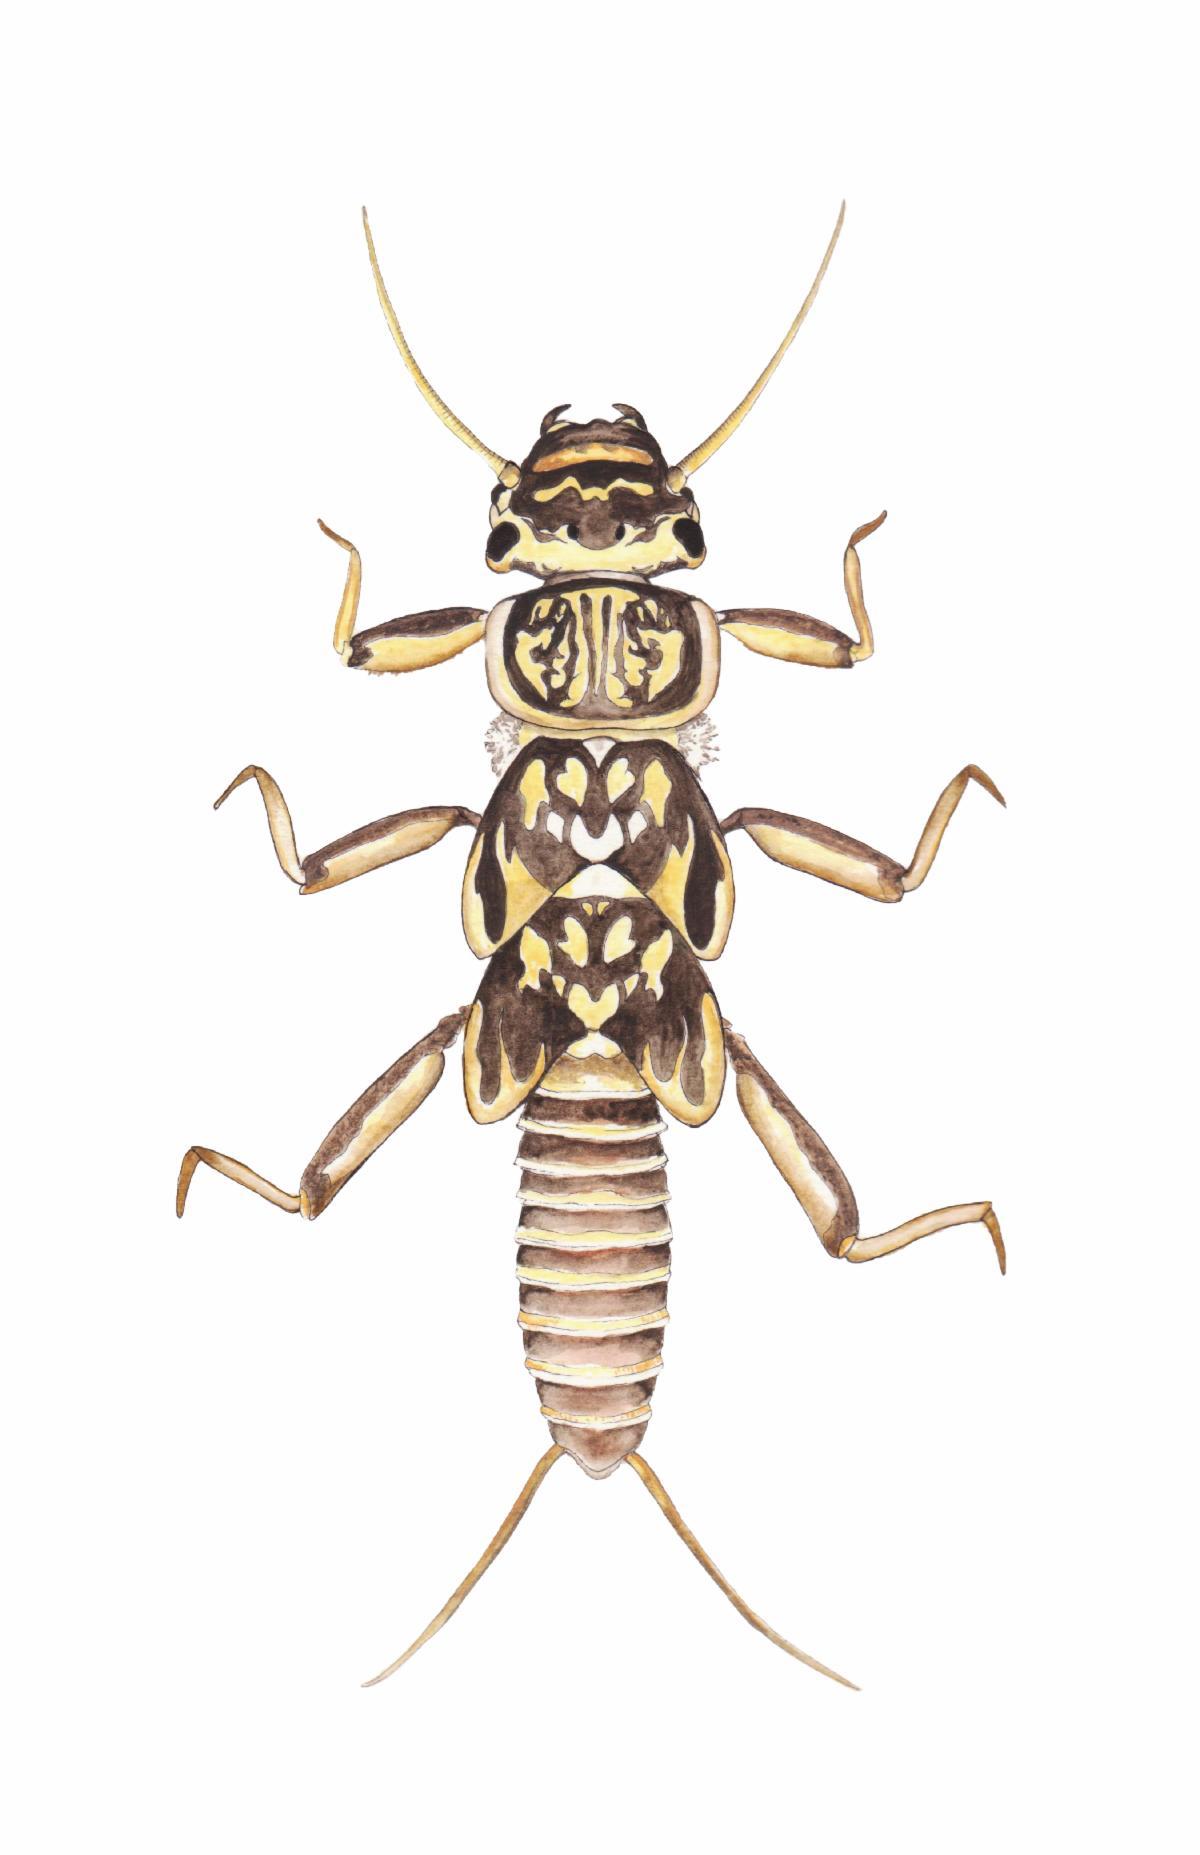 Painting of stonefly larva, brown and yellow